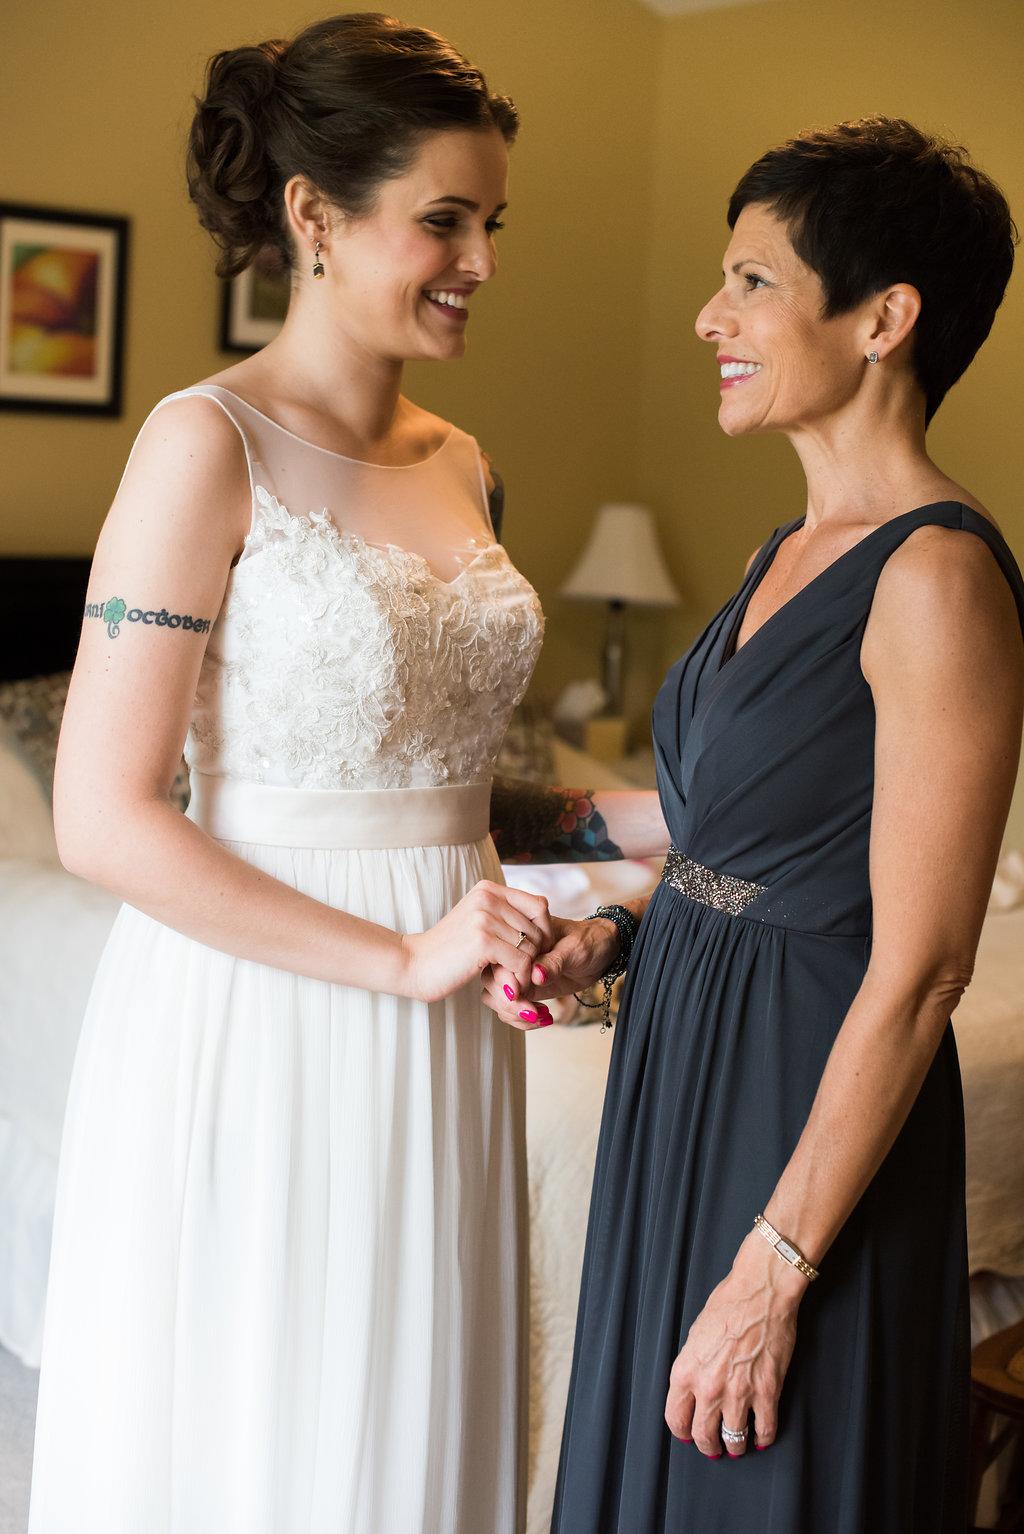 Burlington VT Weddingphotography--gettingready-129.jpg